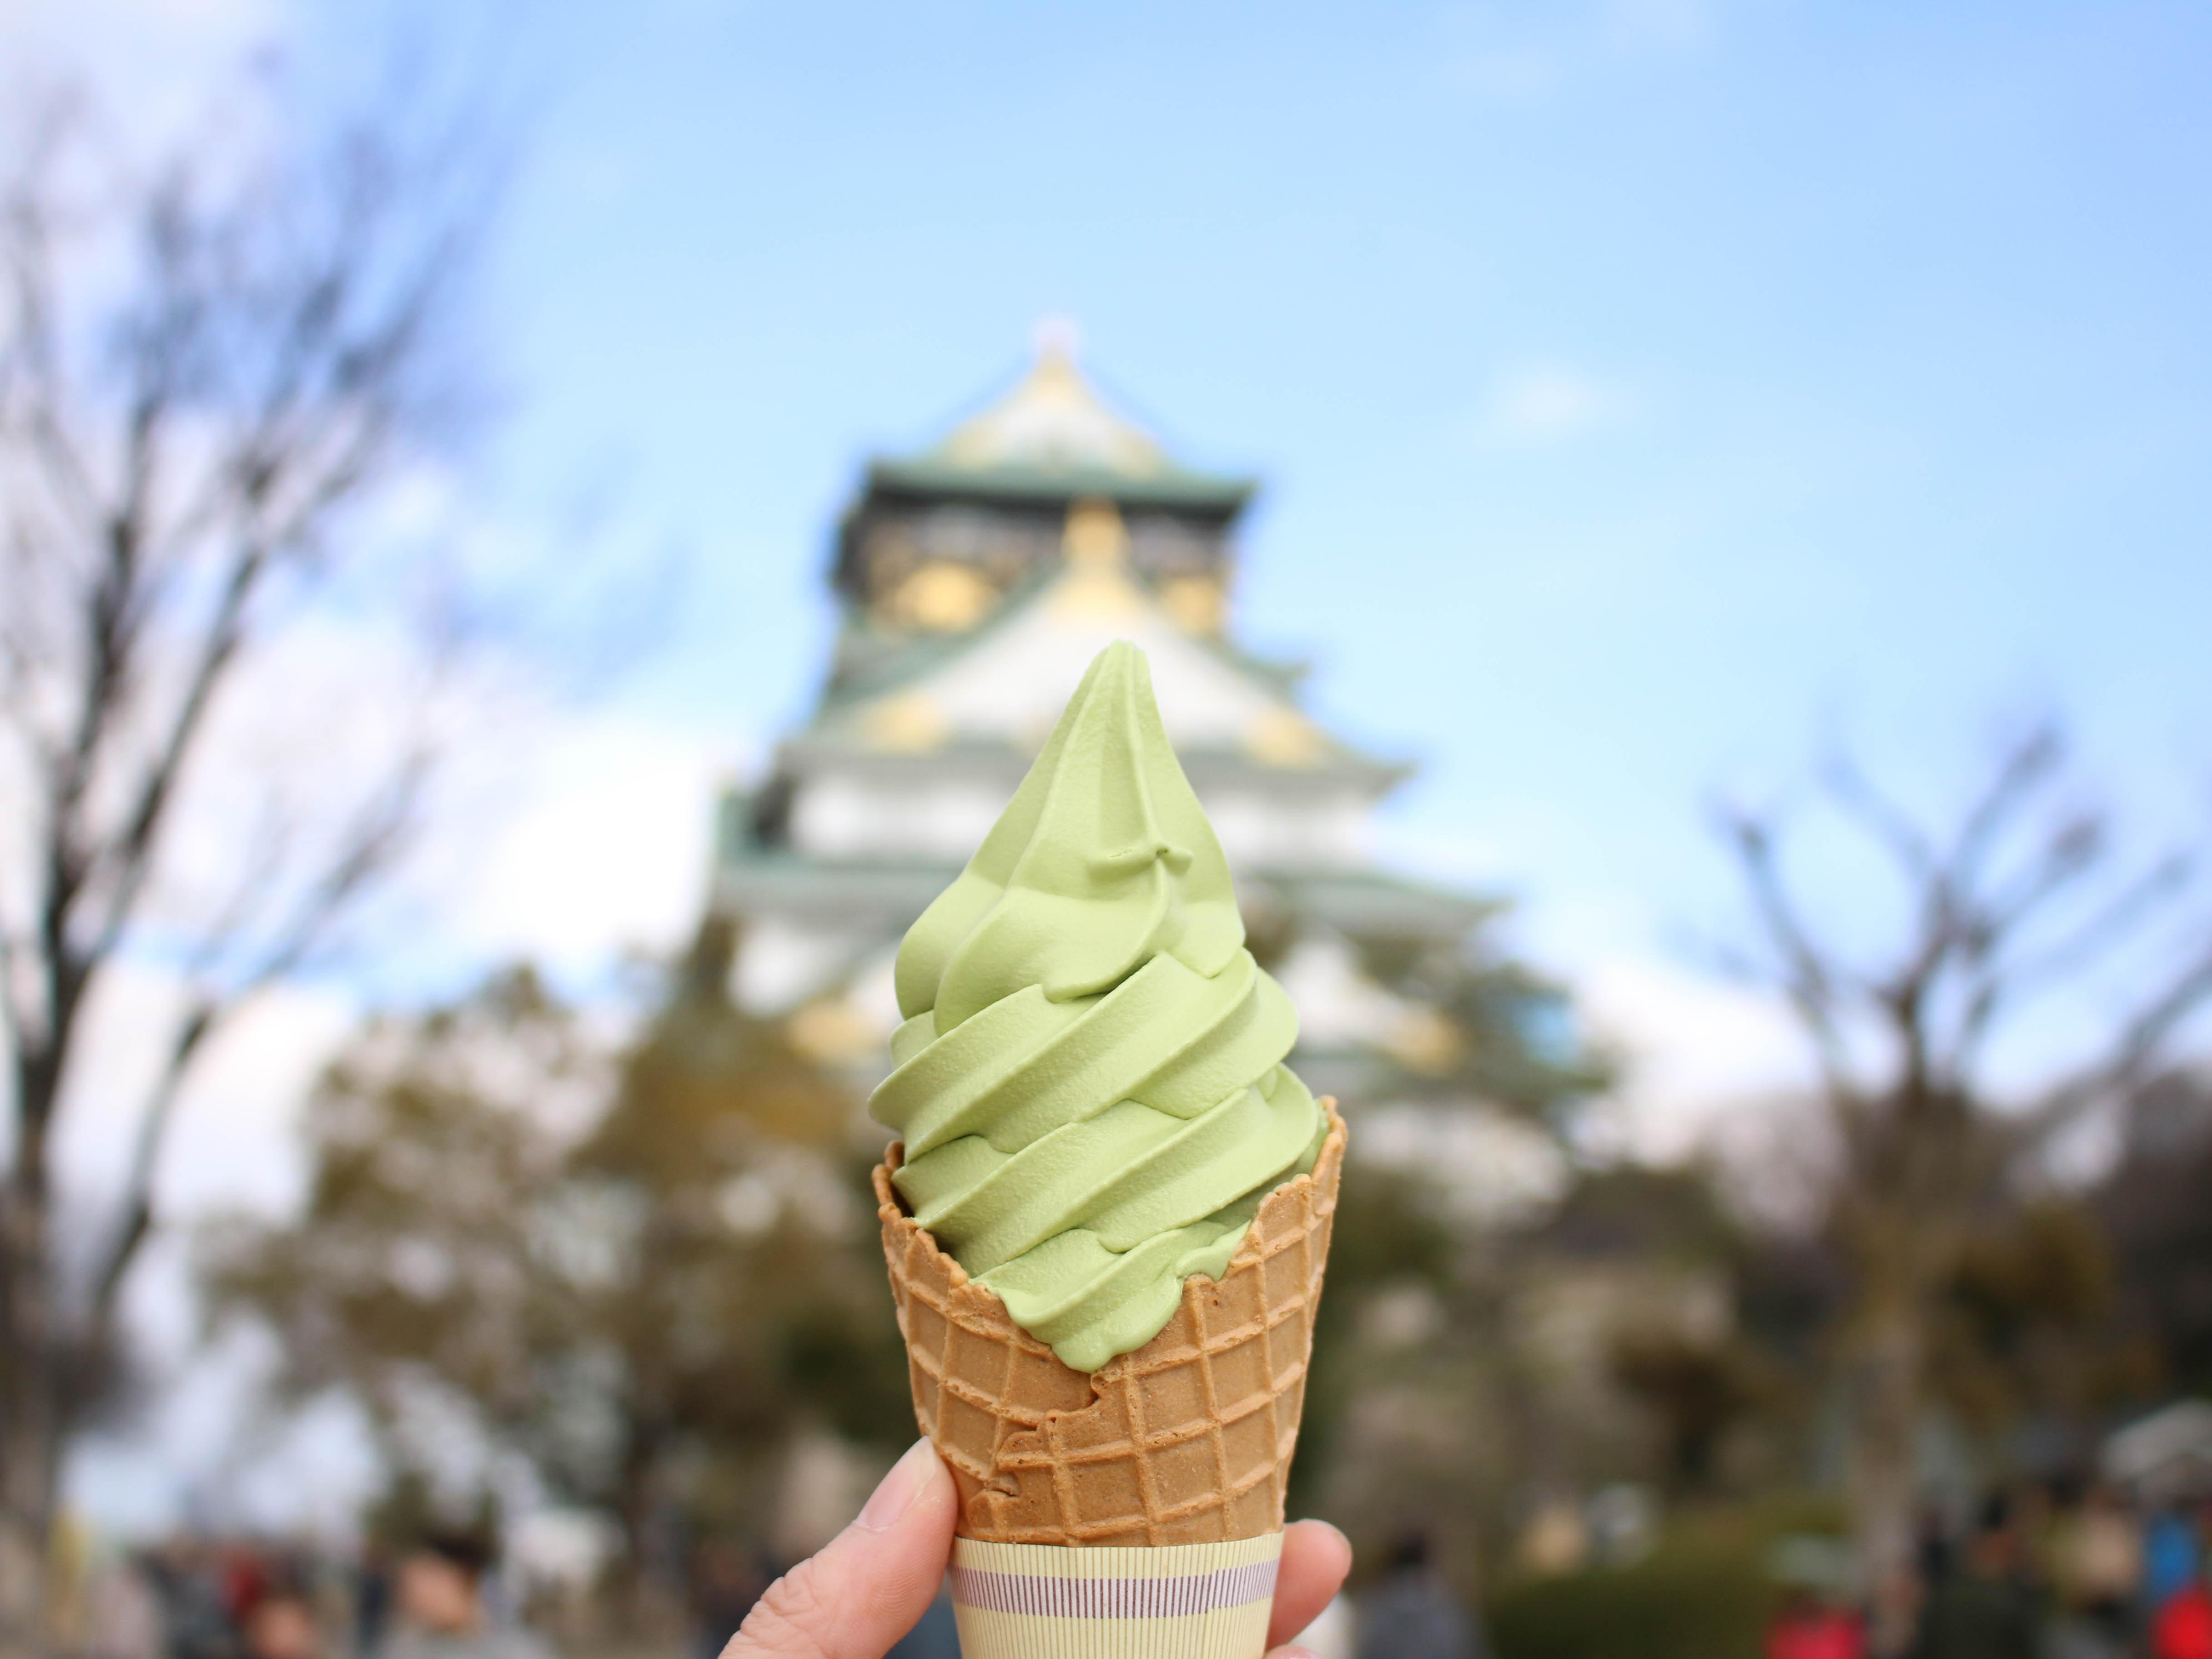 ẩm thực osaka: kem matcha ở osaka jou honzen